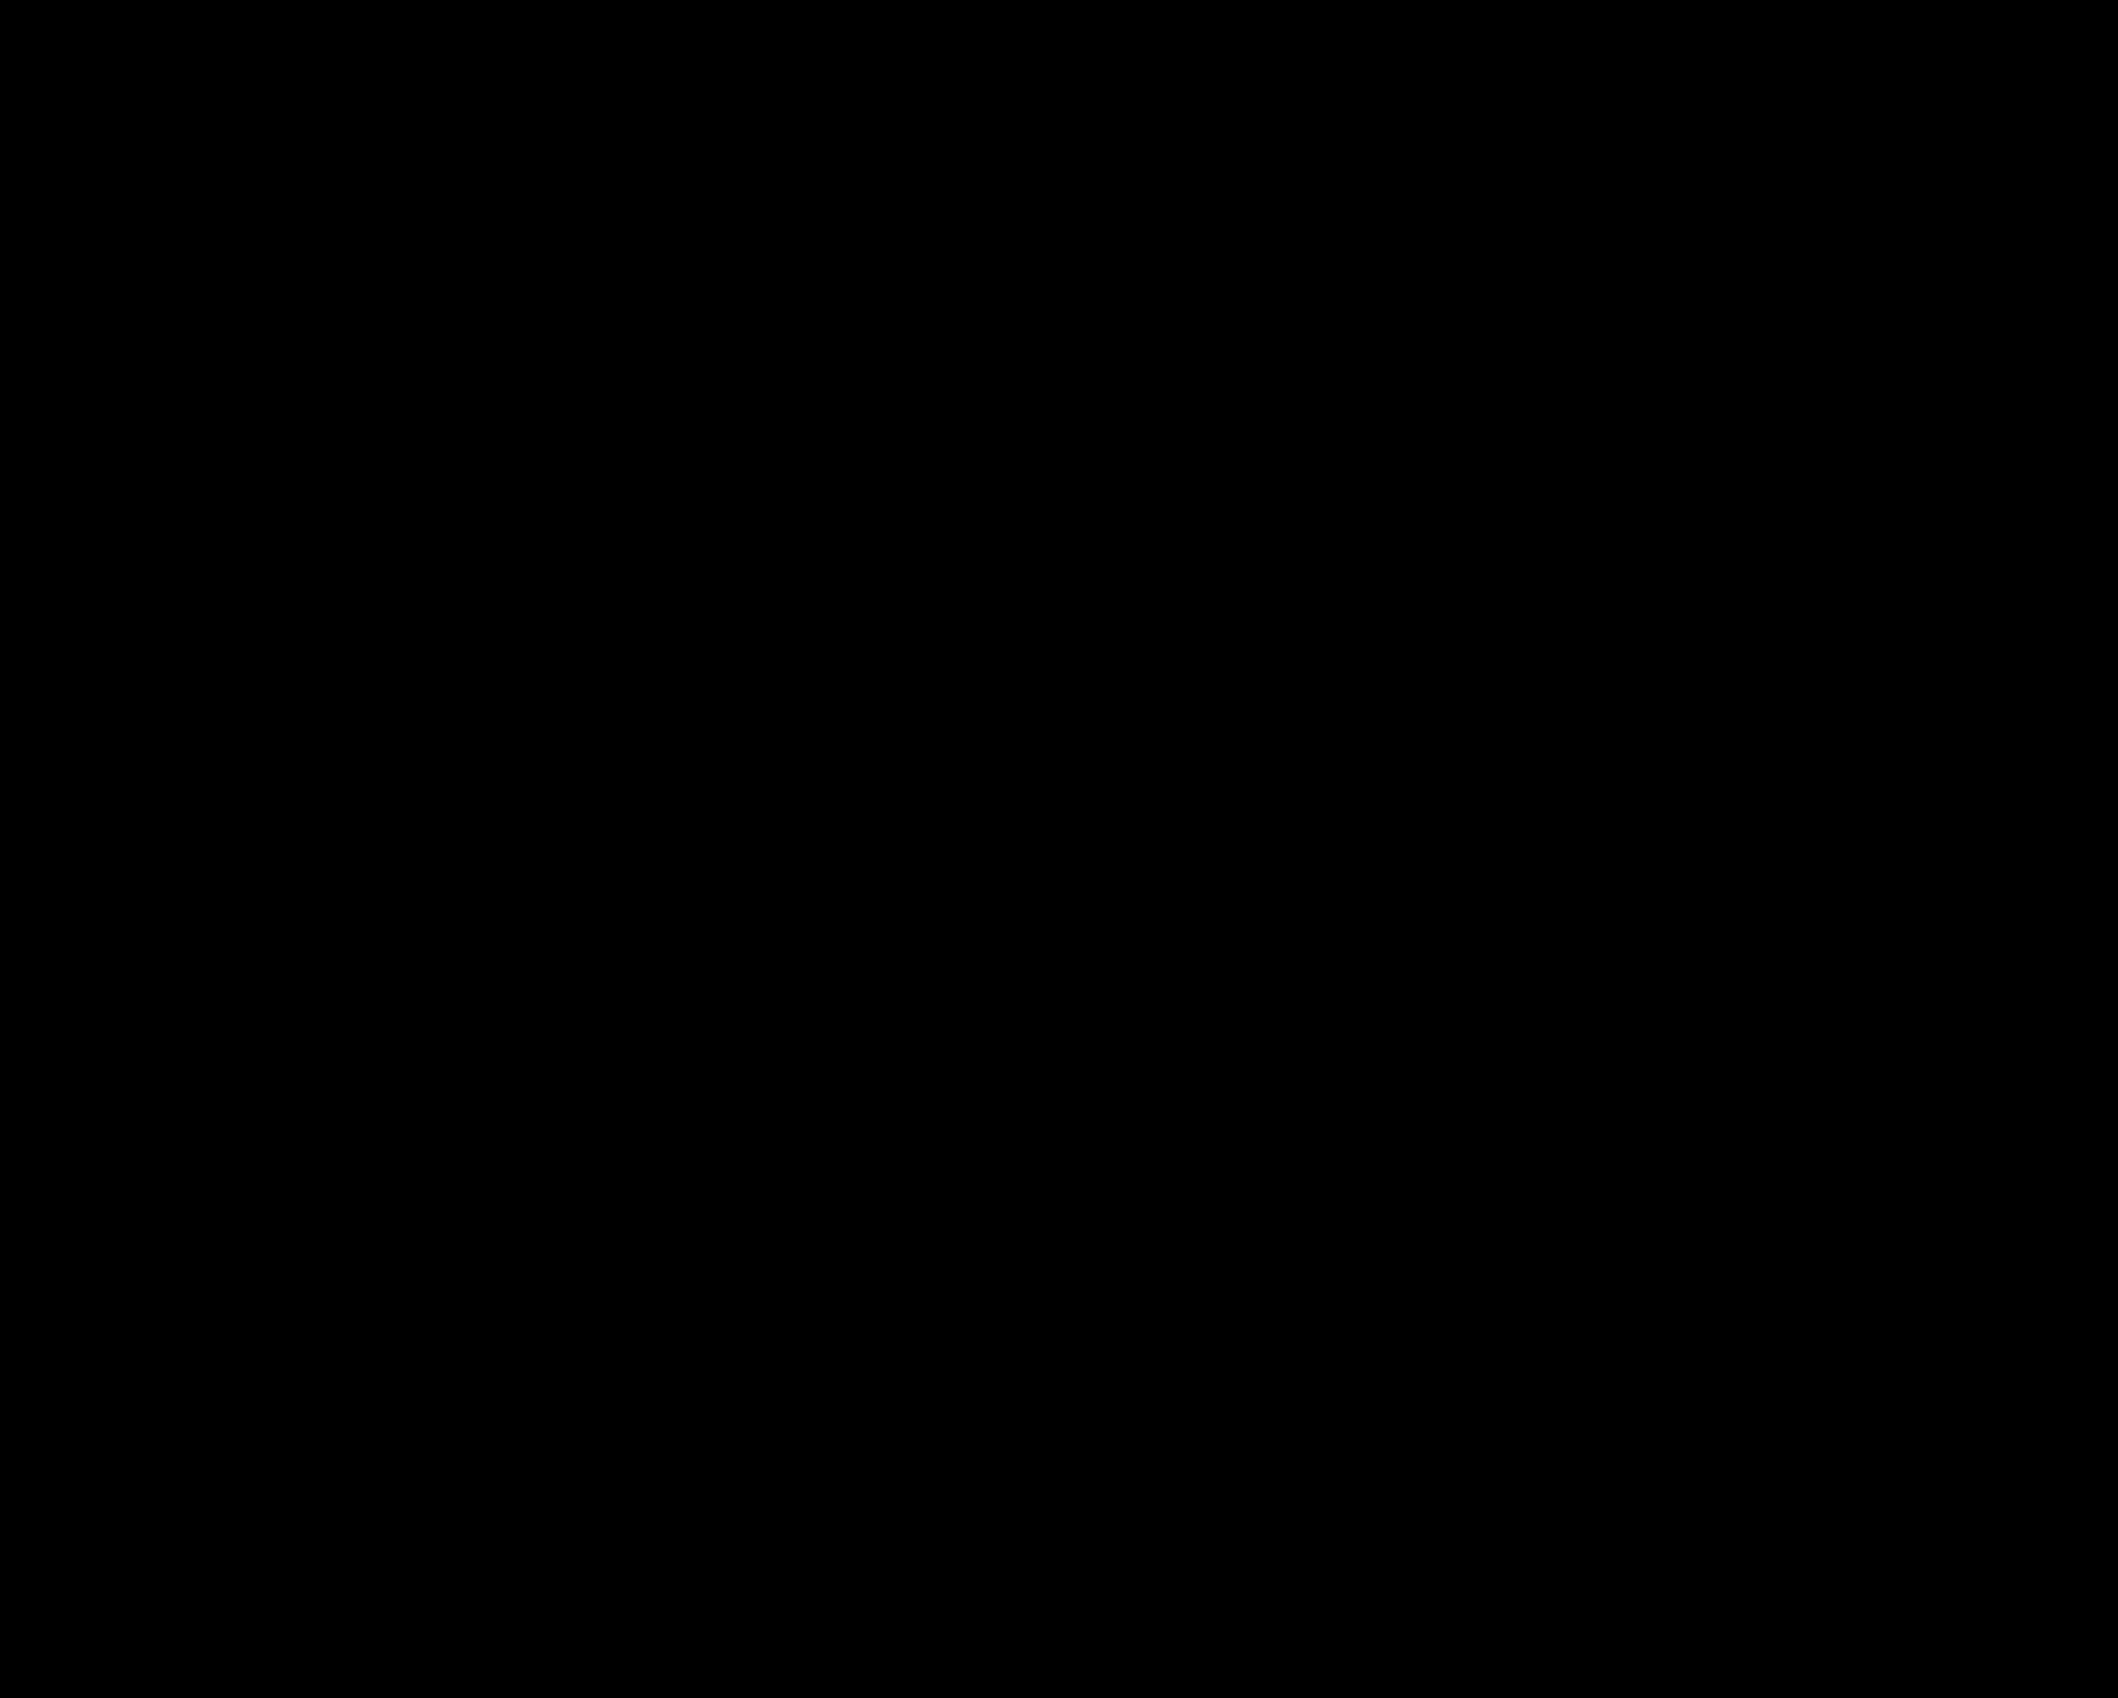 Sailboat silhouette clip art - .